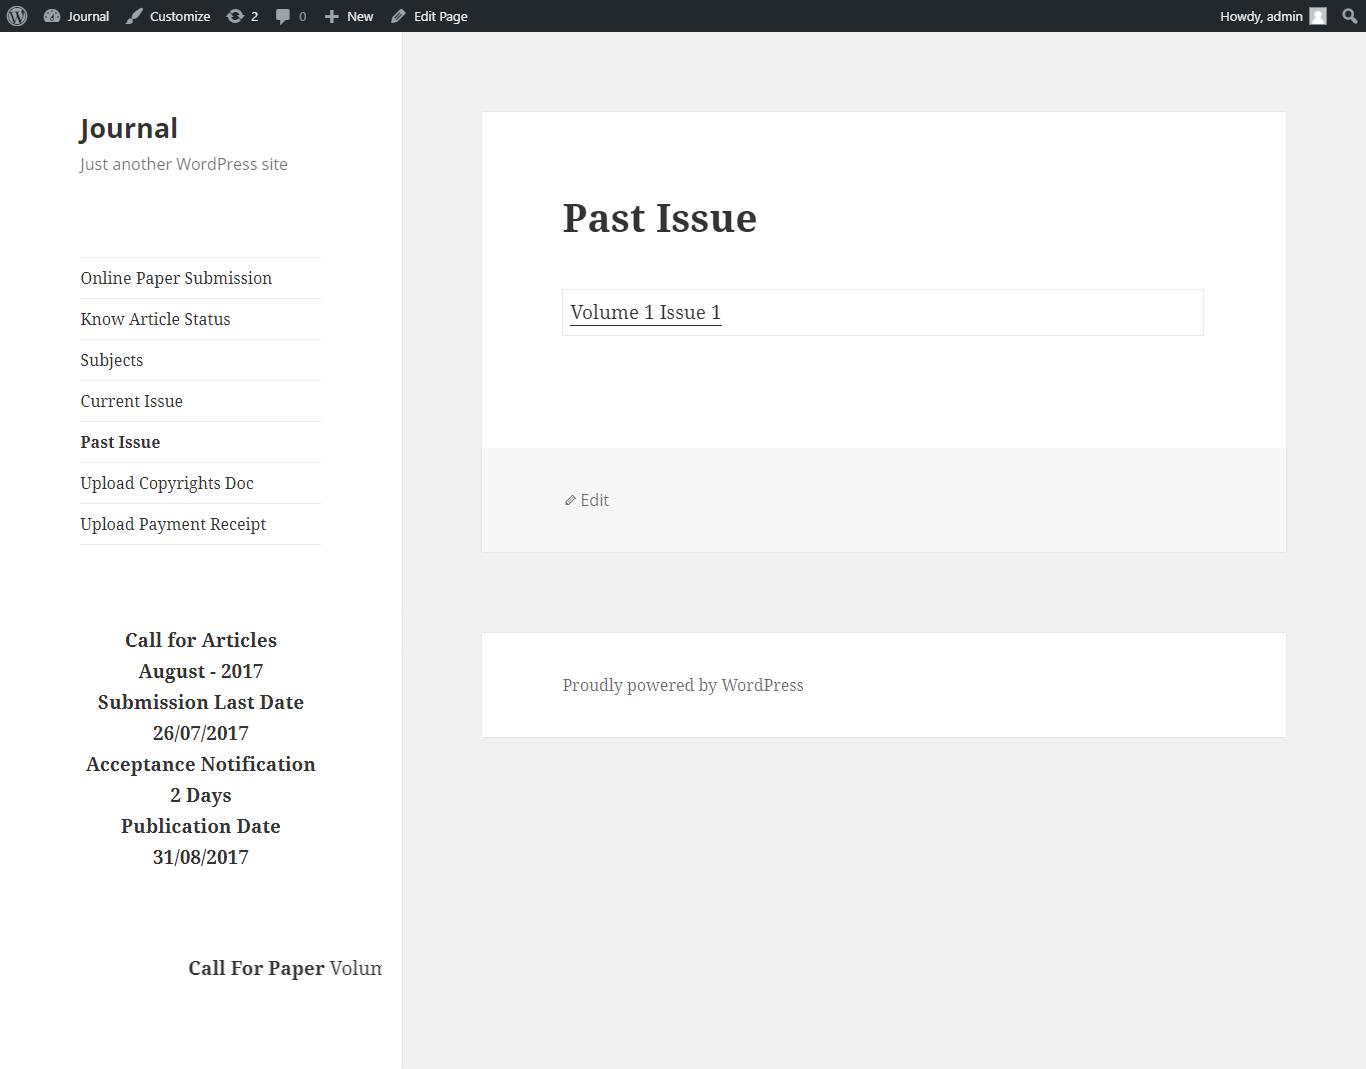 Journal research publication wordpress plugin by hyvikk codecanyon 25stpastissueg publicscrutiny Choice Image